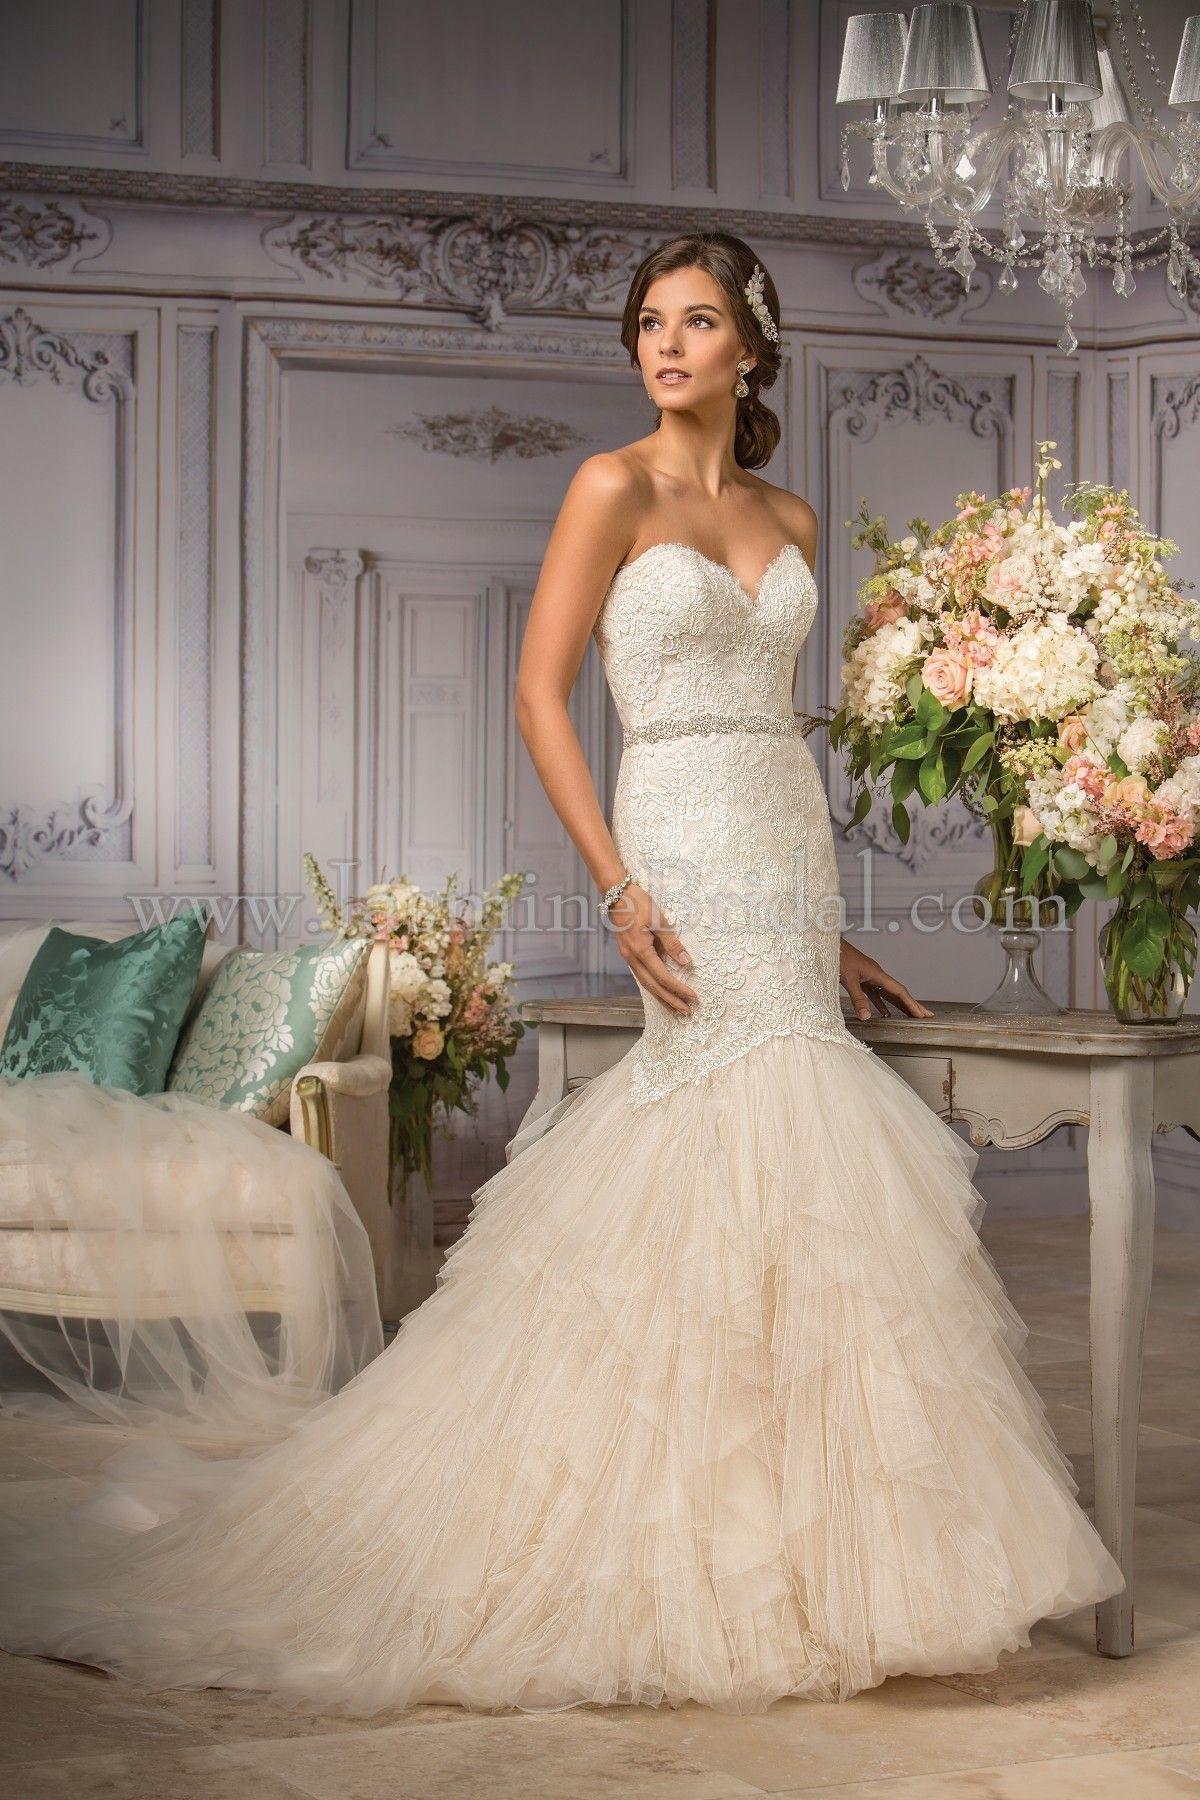 Jasmine wedding dresses  Jasmine Bridal Couture Style T in Ivory  Gold   Jasmine